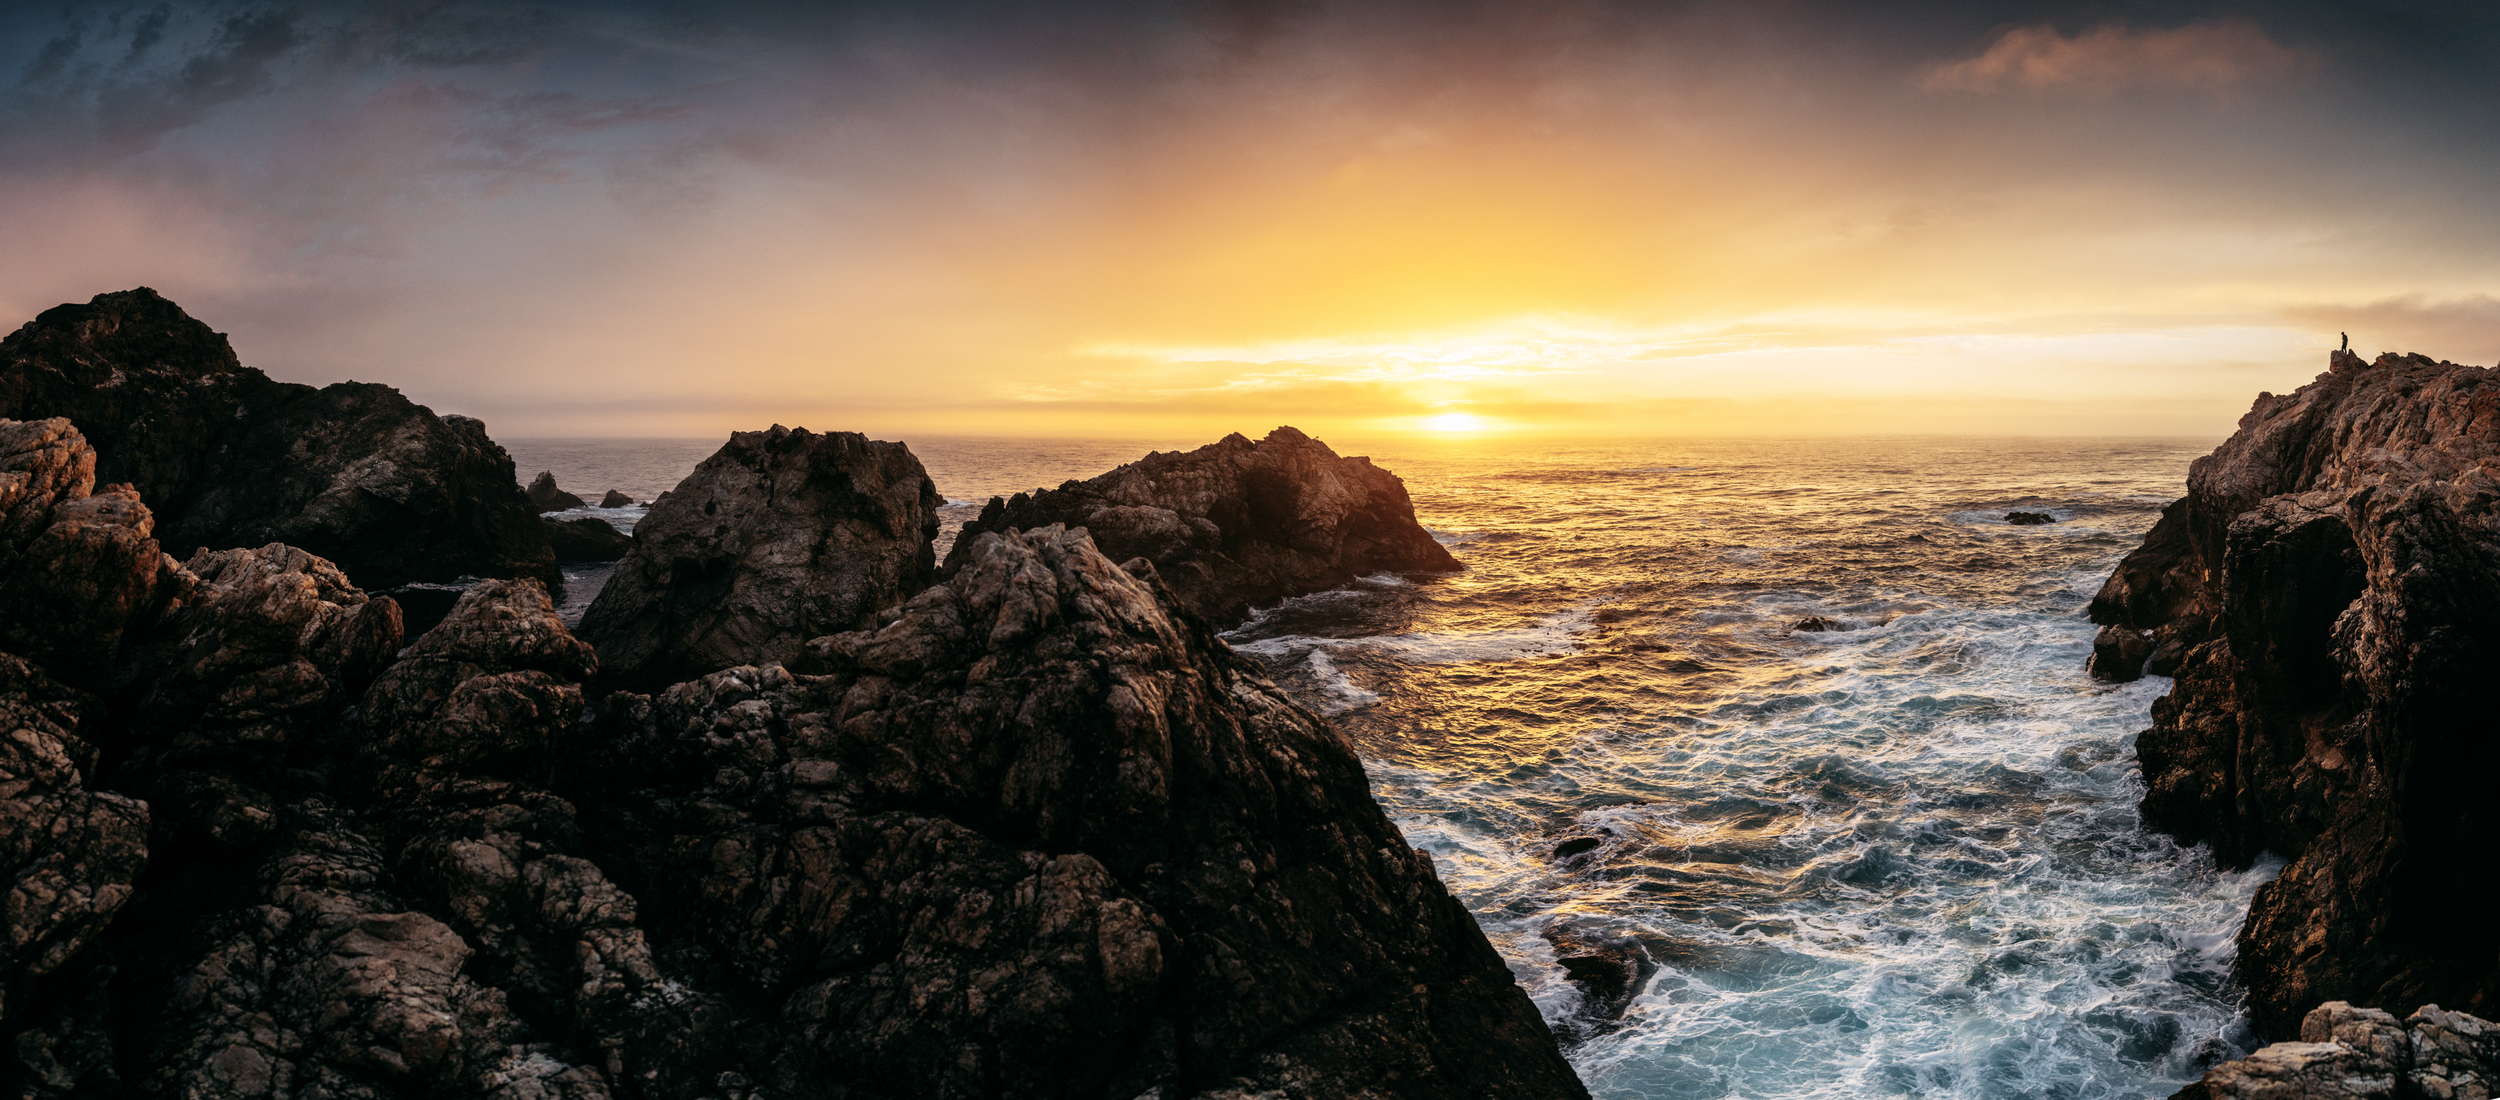 Monterey-7964-Pano-Edit.jpg